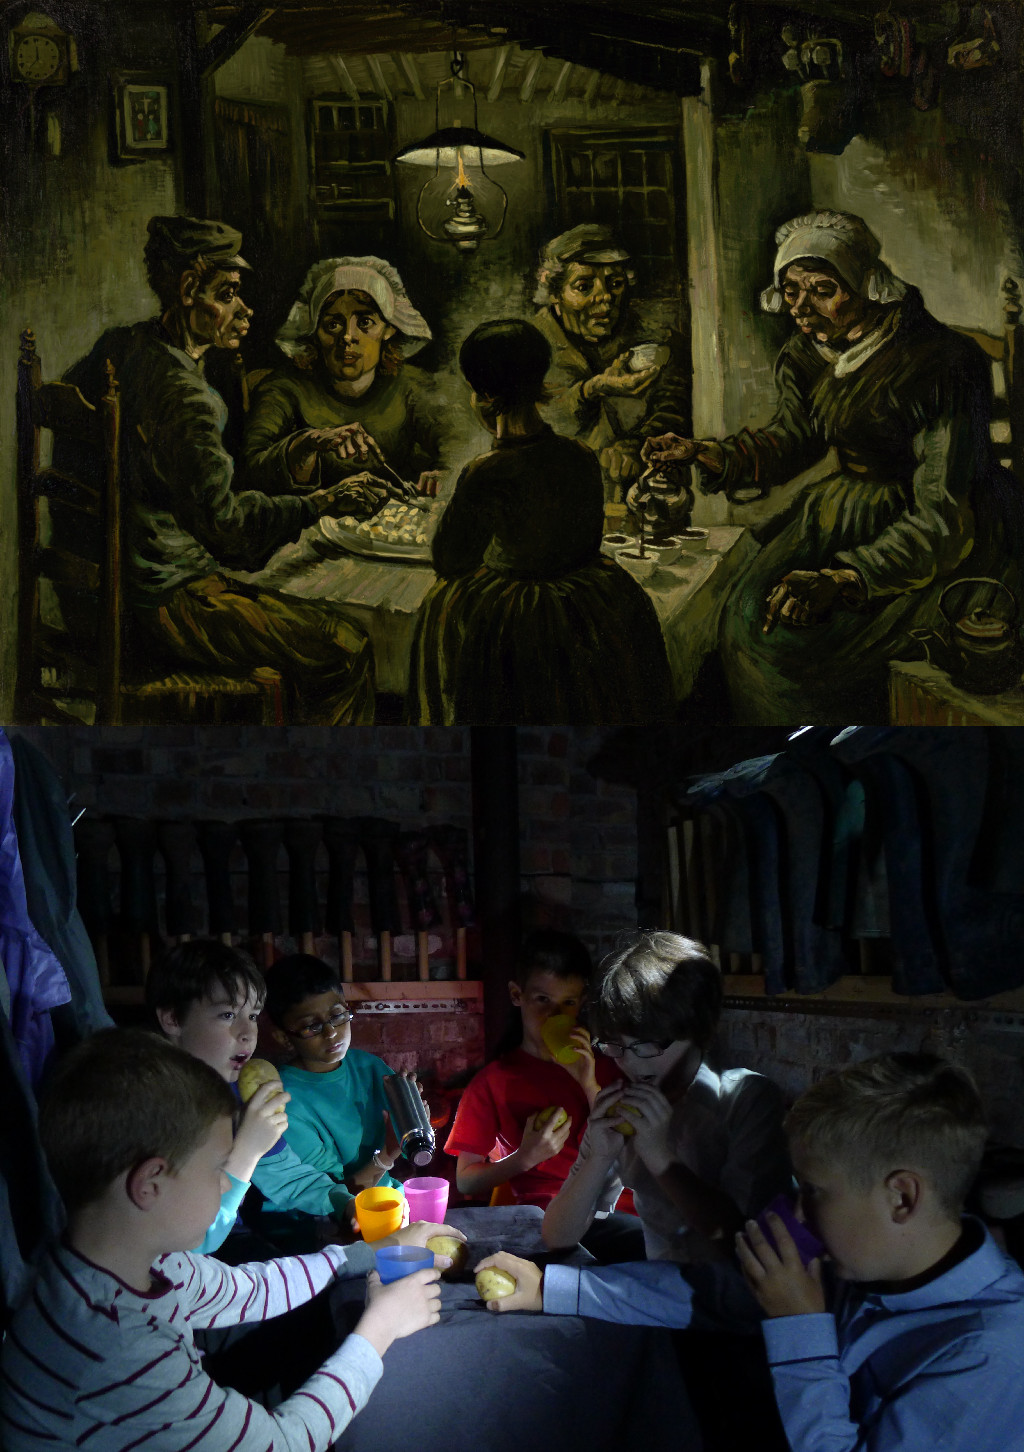 The Potato Eaters, Vincent van Gogh (1853-1890) vanGo'd by Eagley Junior School - Lewis, Cameron, Sachin, Luke, Caspar, Matthew